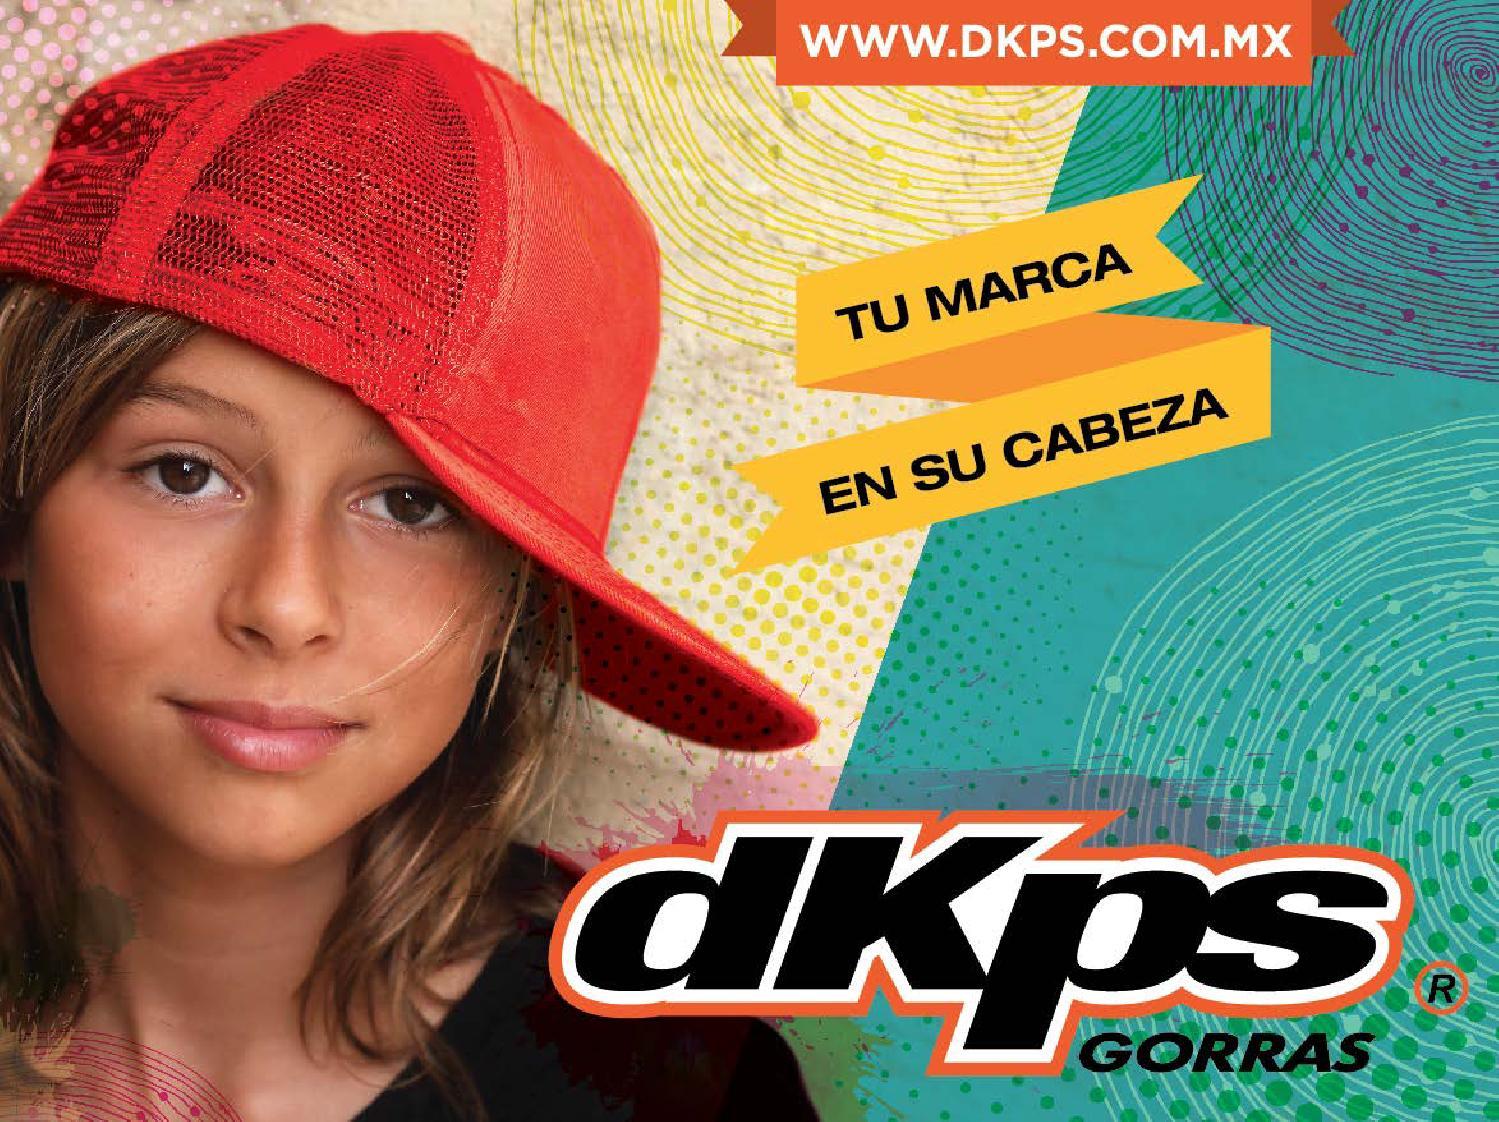 Catalogo gorras DKPS by CUELLO BLANCO DKPS MAYORK  queretaro playerasymas.com.mx - issuu a17f0e61169